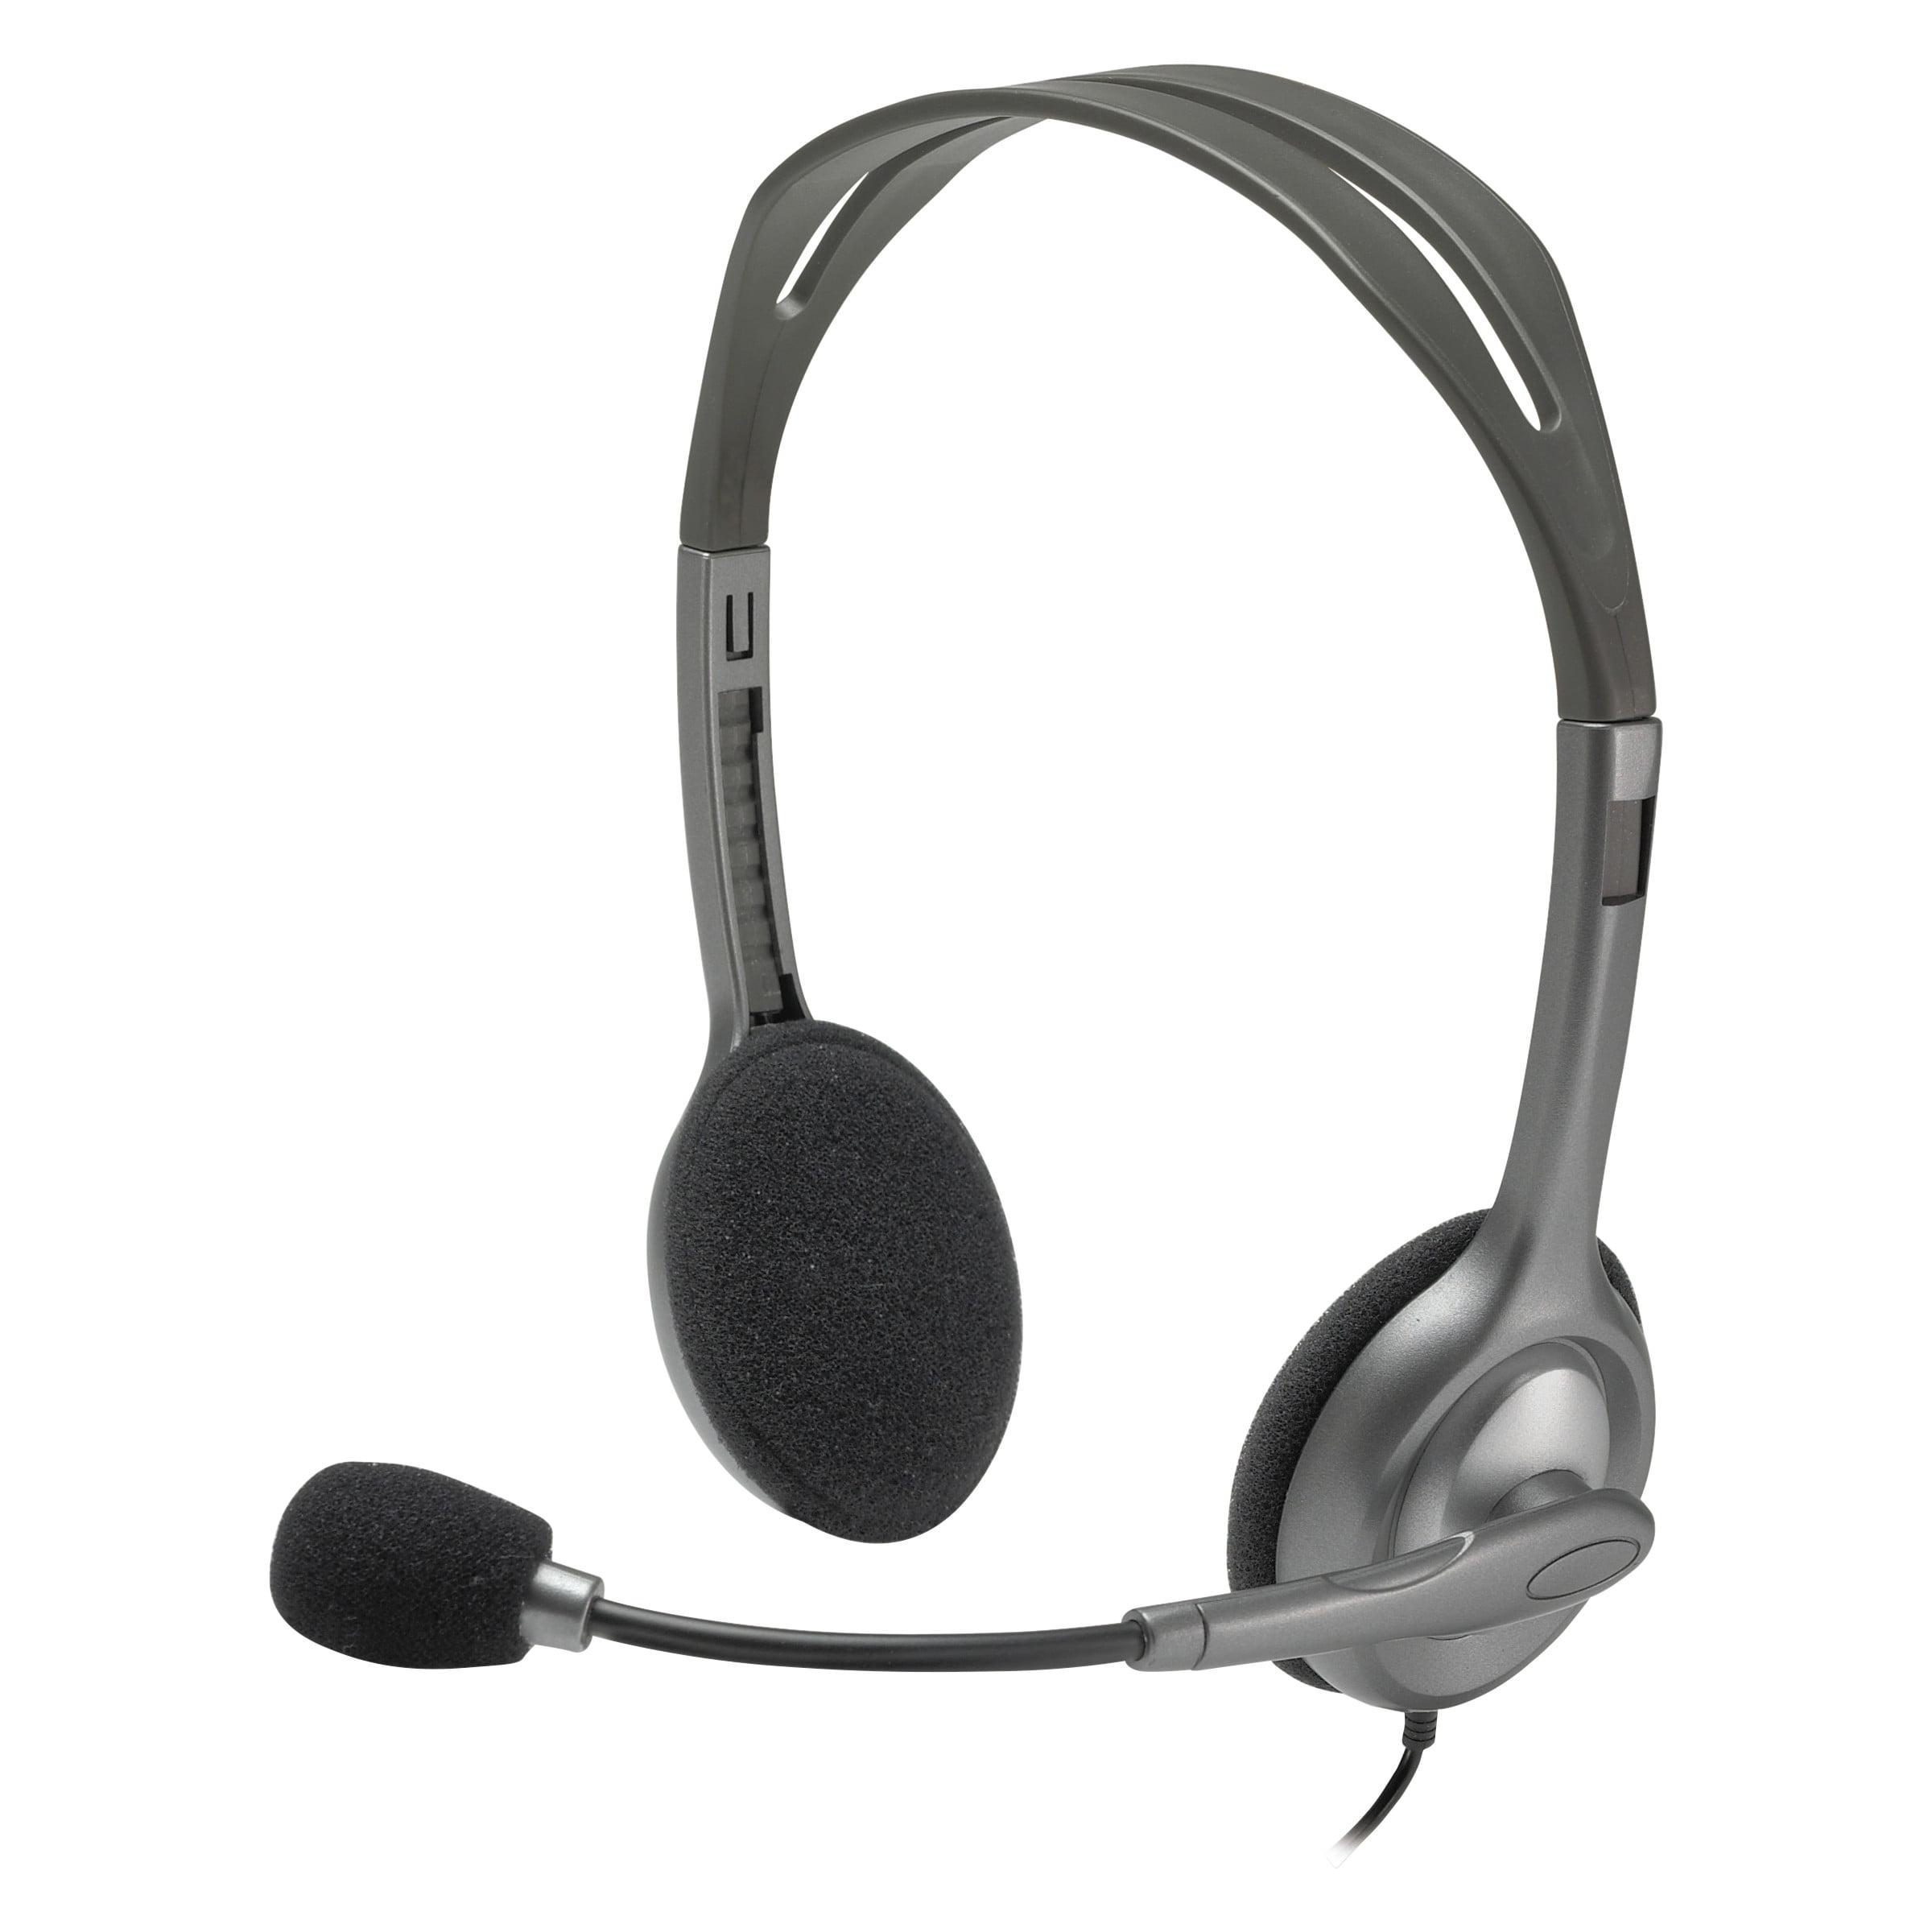 Logitech H111 Binaural Over-the-Head, Stereo Headset, Black/Silver